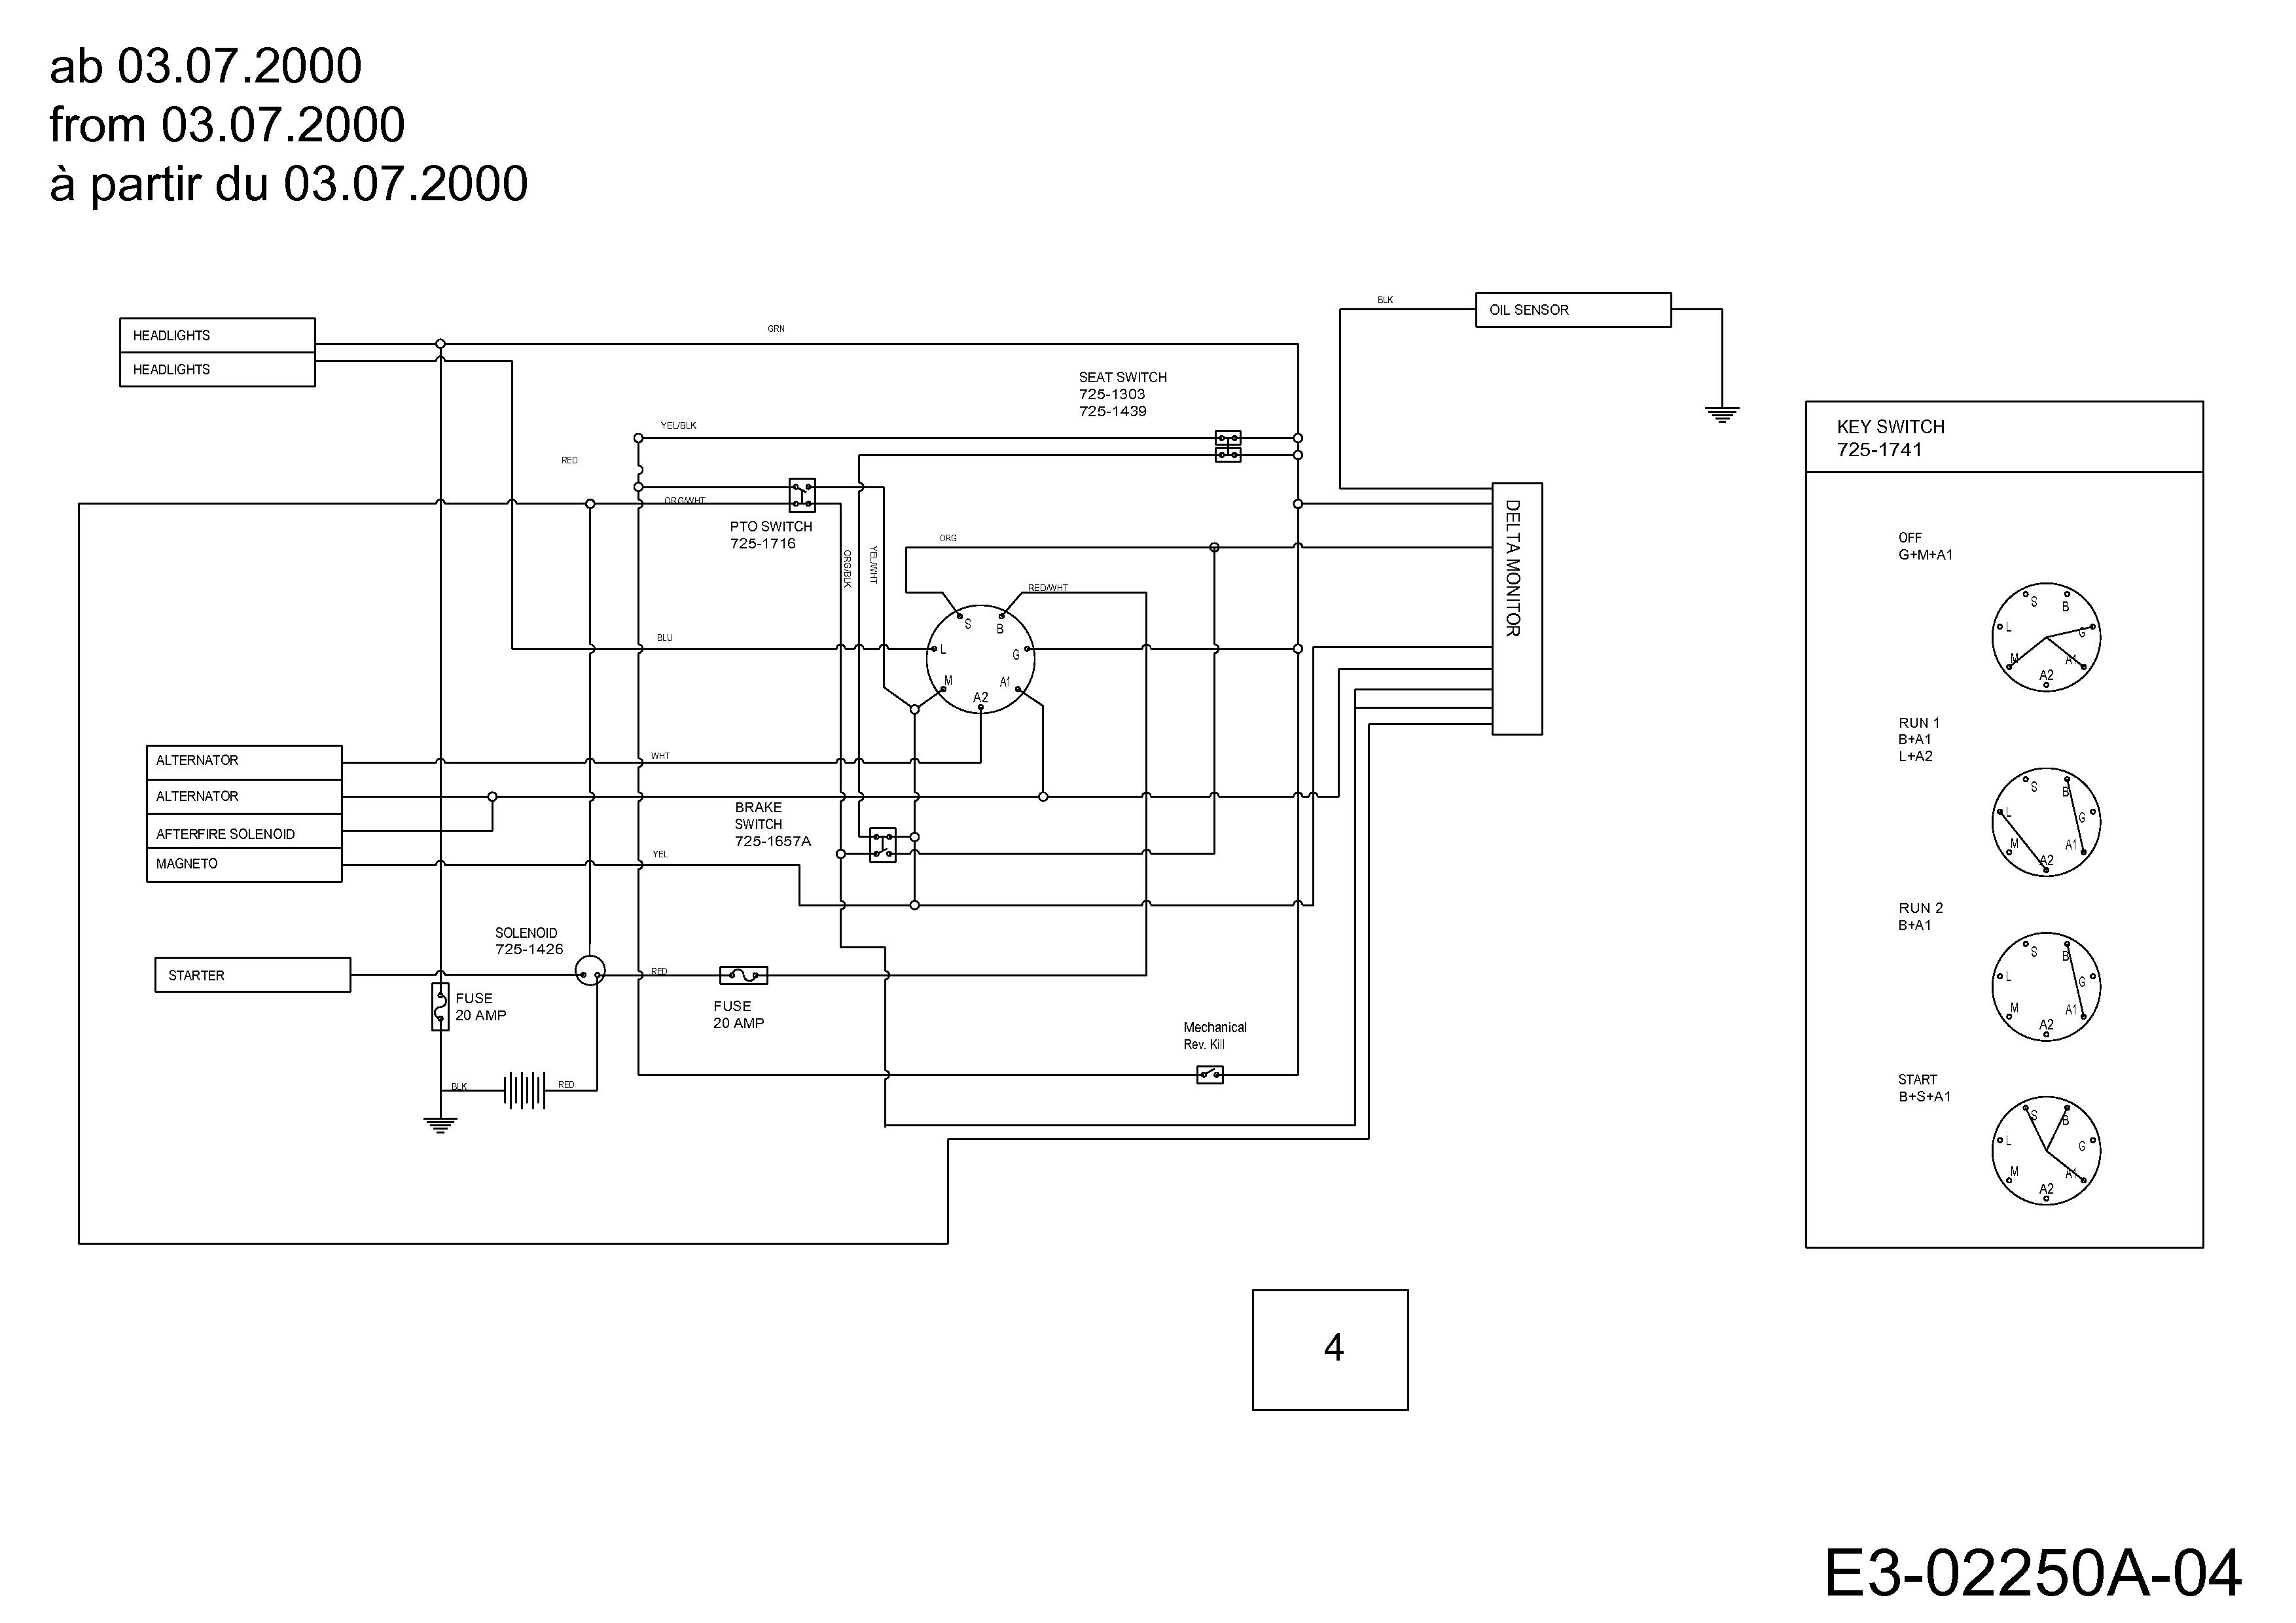 Yard-Man AH 6180 Schaltplan ab 03.07.2000 13AT604H643 (2001)